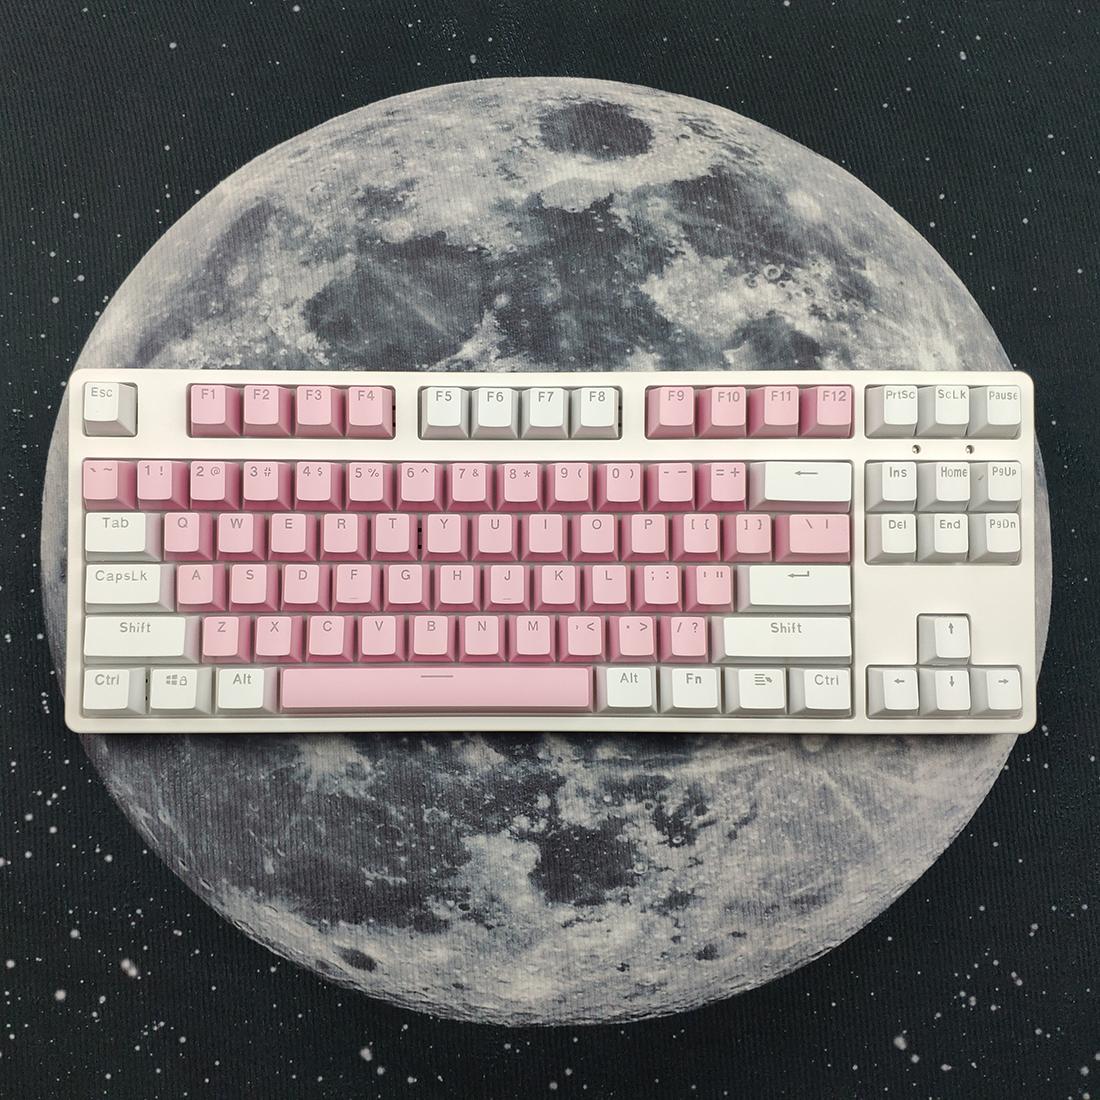 87 Keys Mechanical Gaming Keyboard Custom Hot Swappable (Pink White Keyboard + White Light)